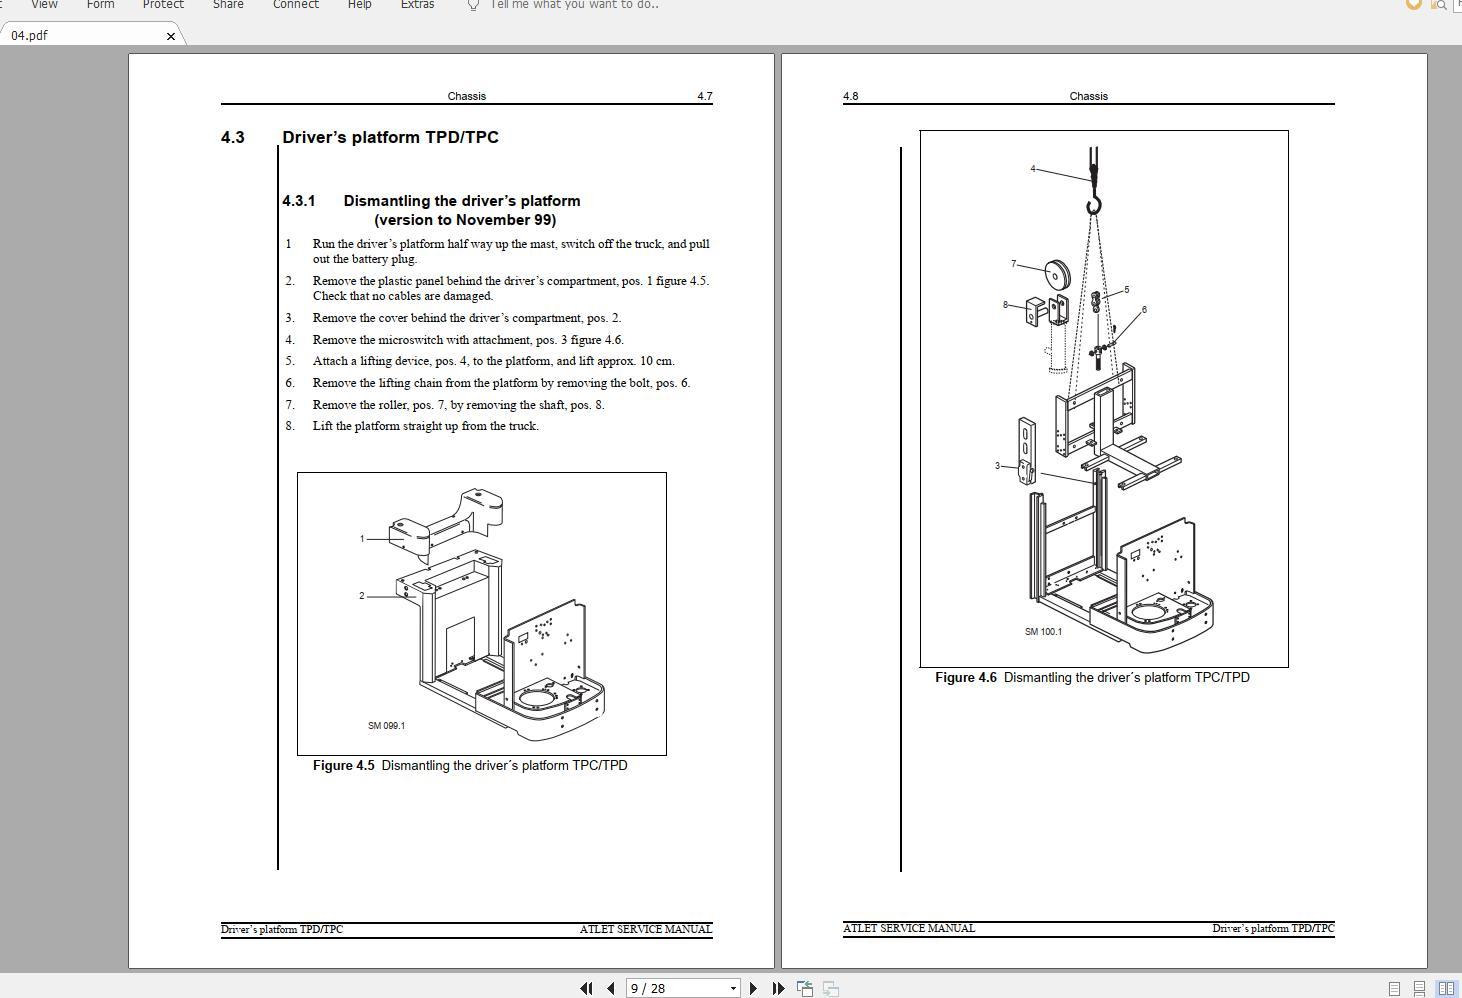 Nissan_Forklift_Warehouse_T_Series_005879_Service_ManualEN_2